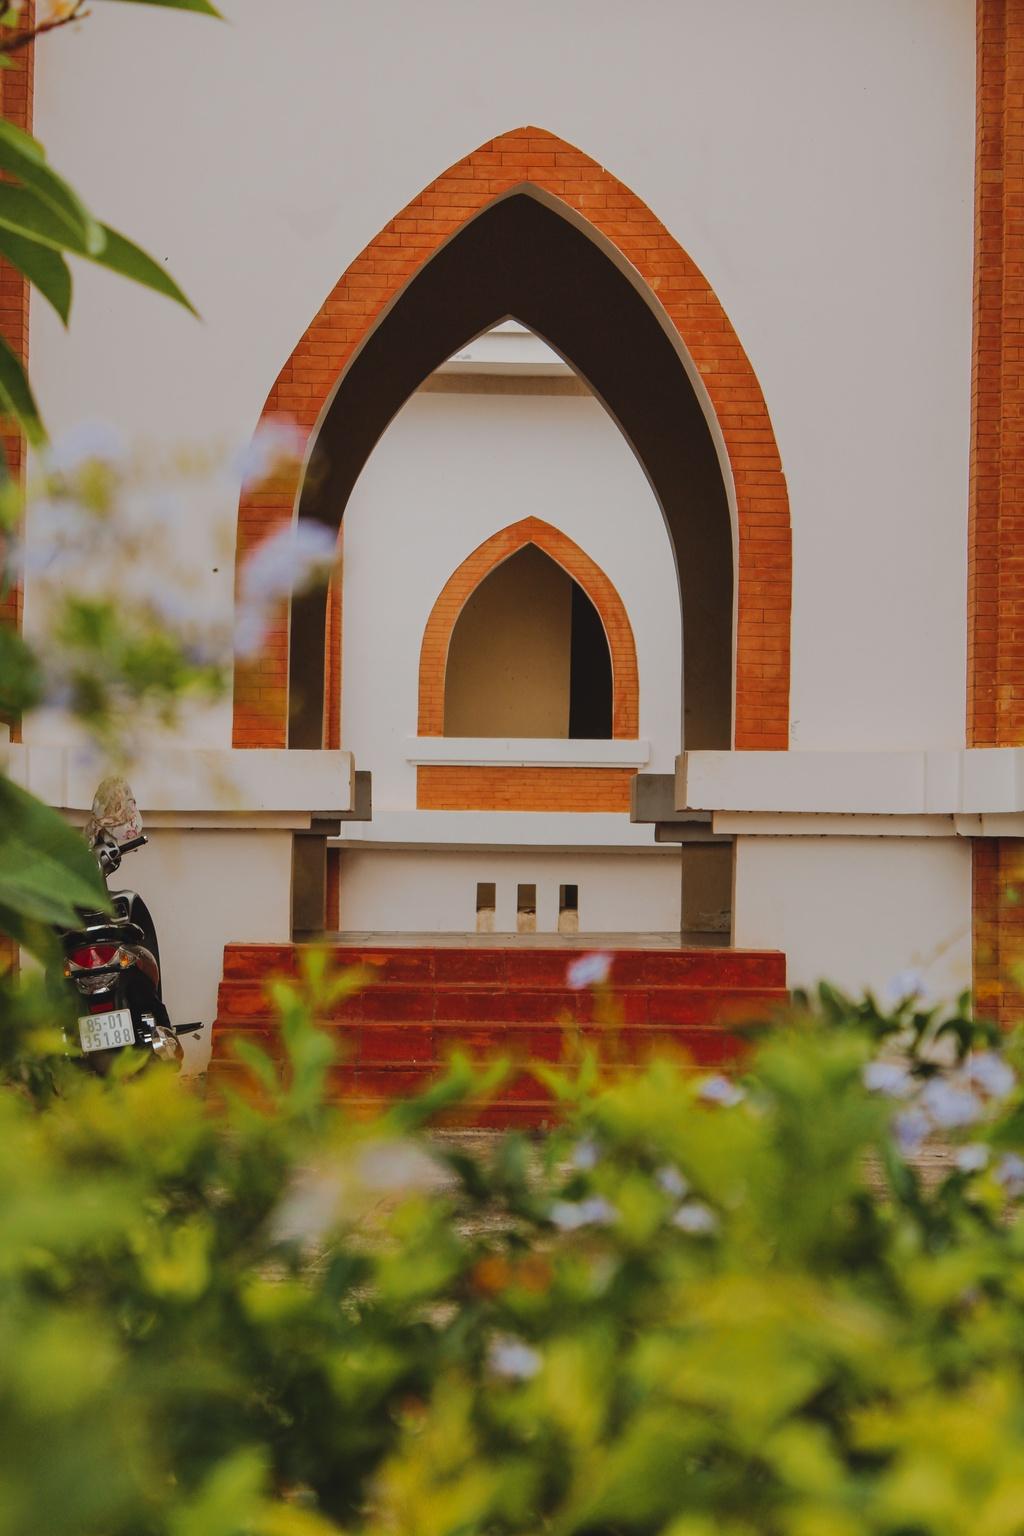 #MyTour: Nhan ai di Ninh Thuan gui ve mien thuong hinh anh 5